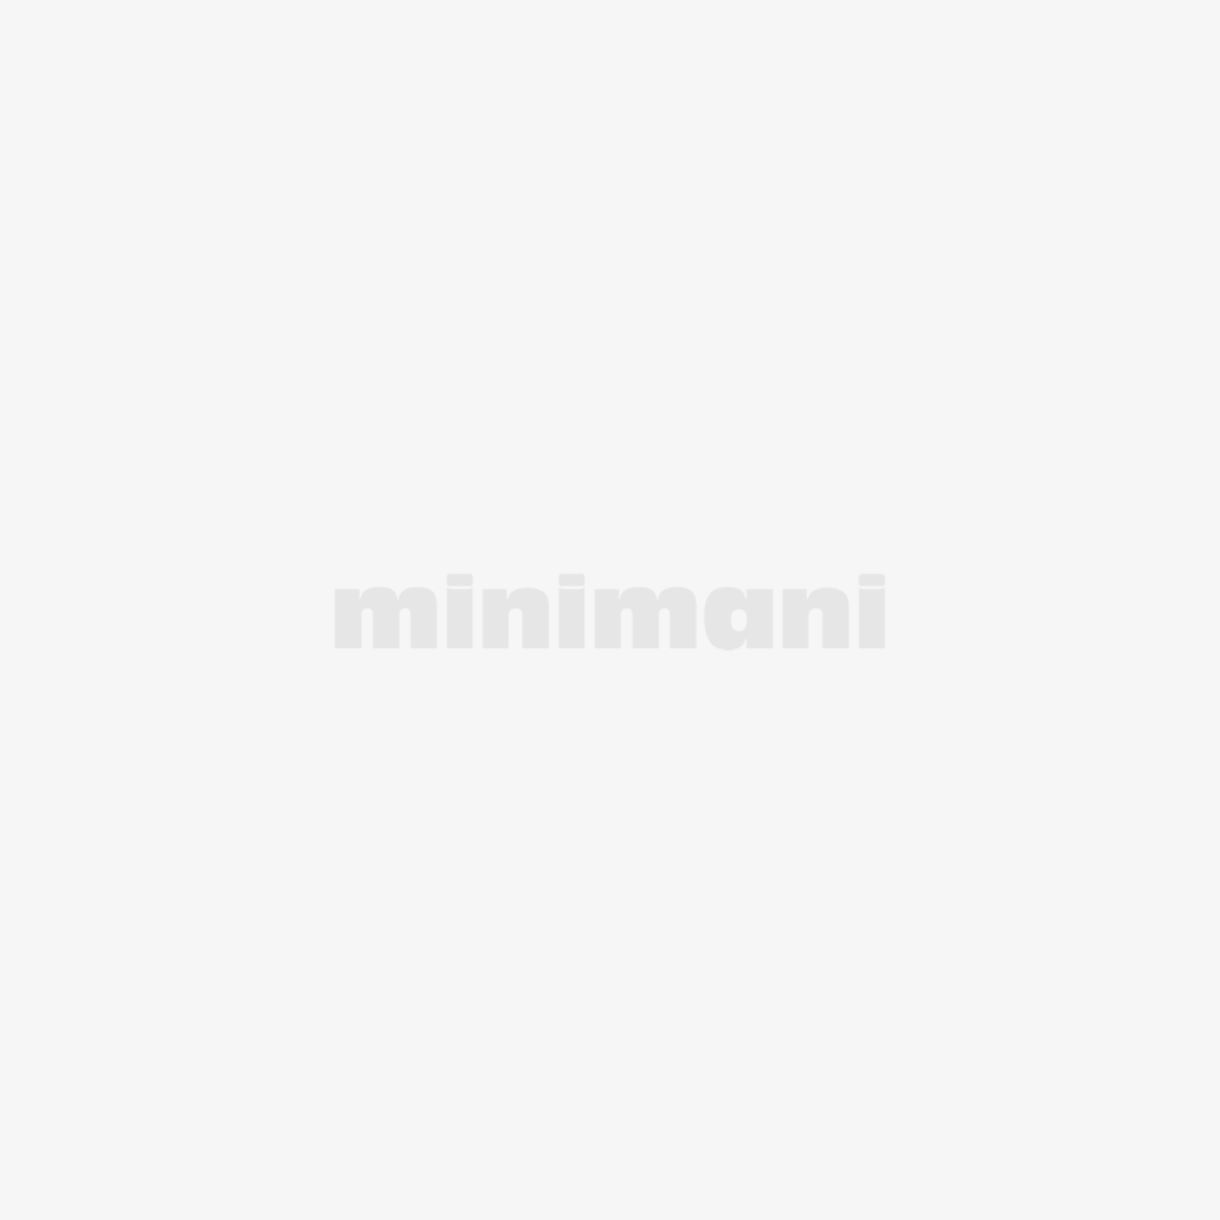 MUOVIAMPPELI 29.5X29.5X16CM